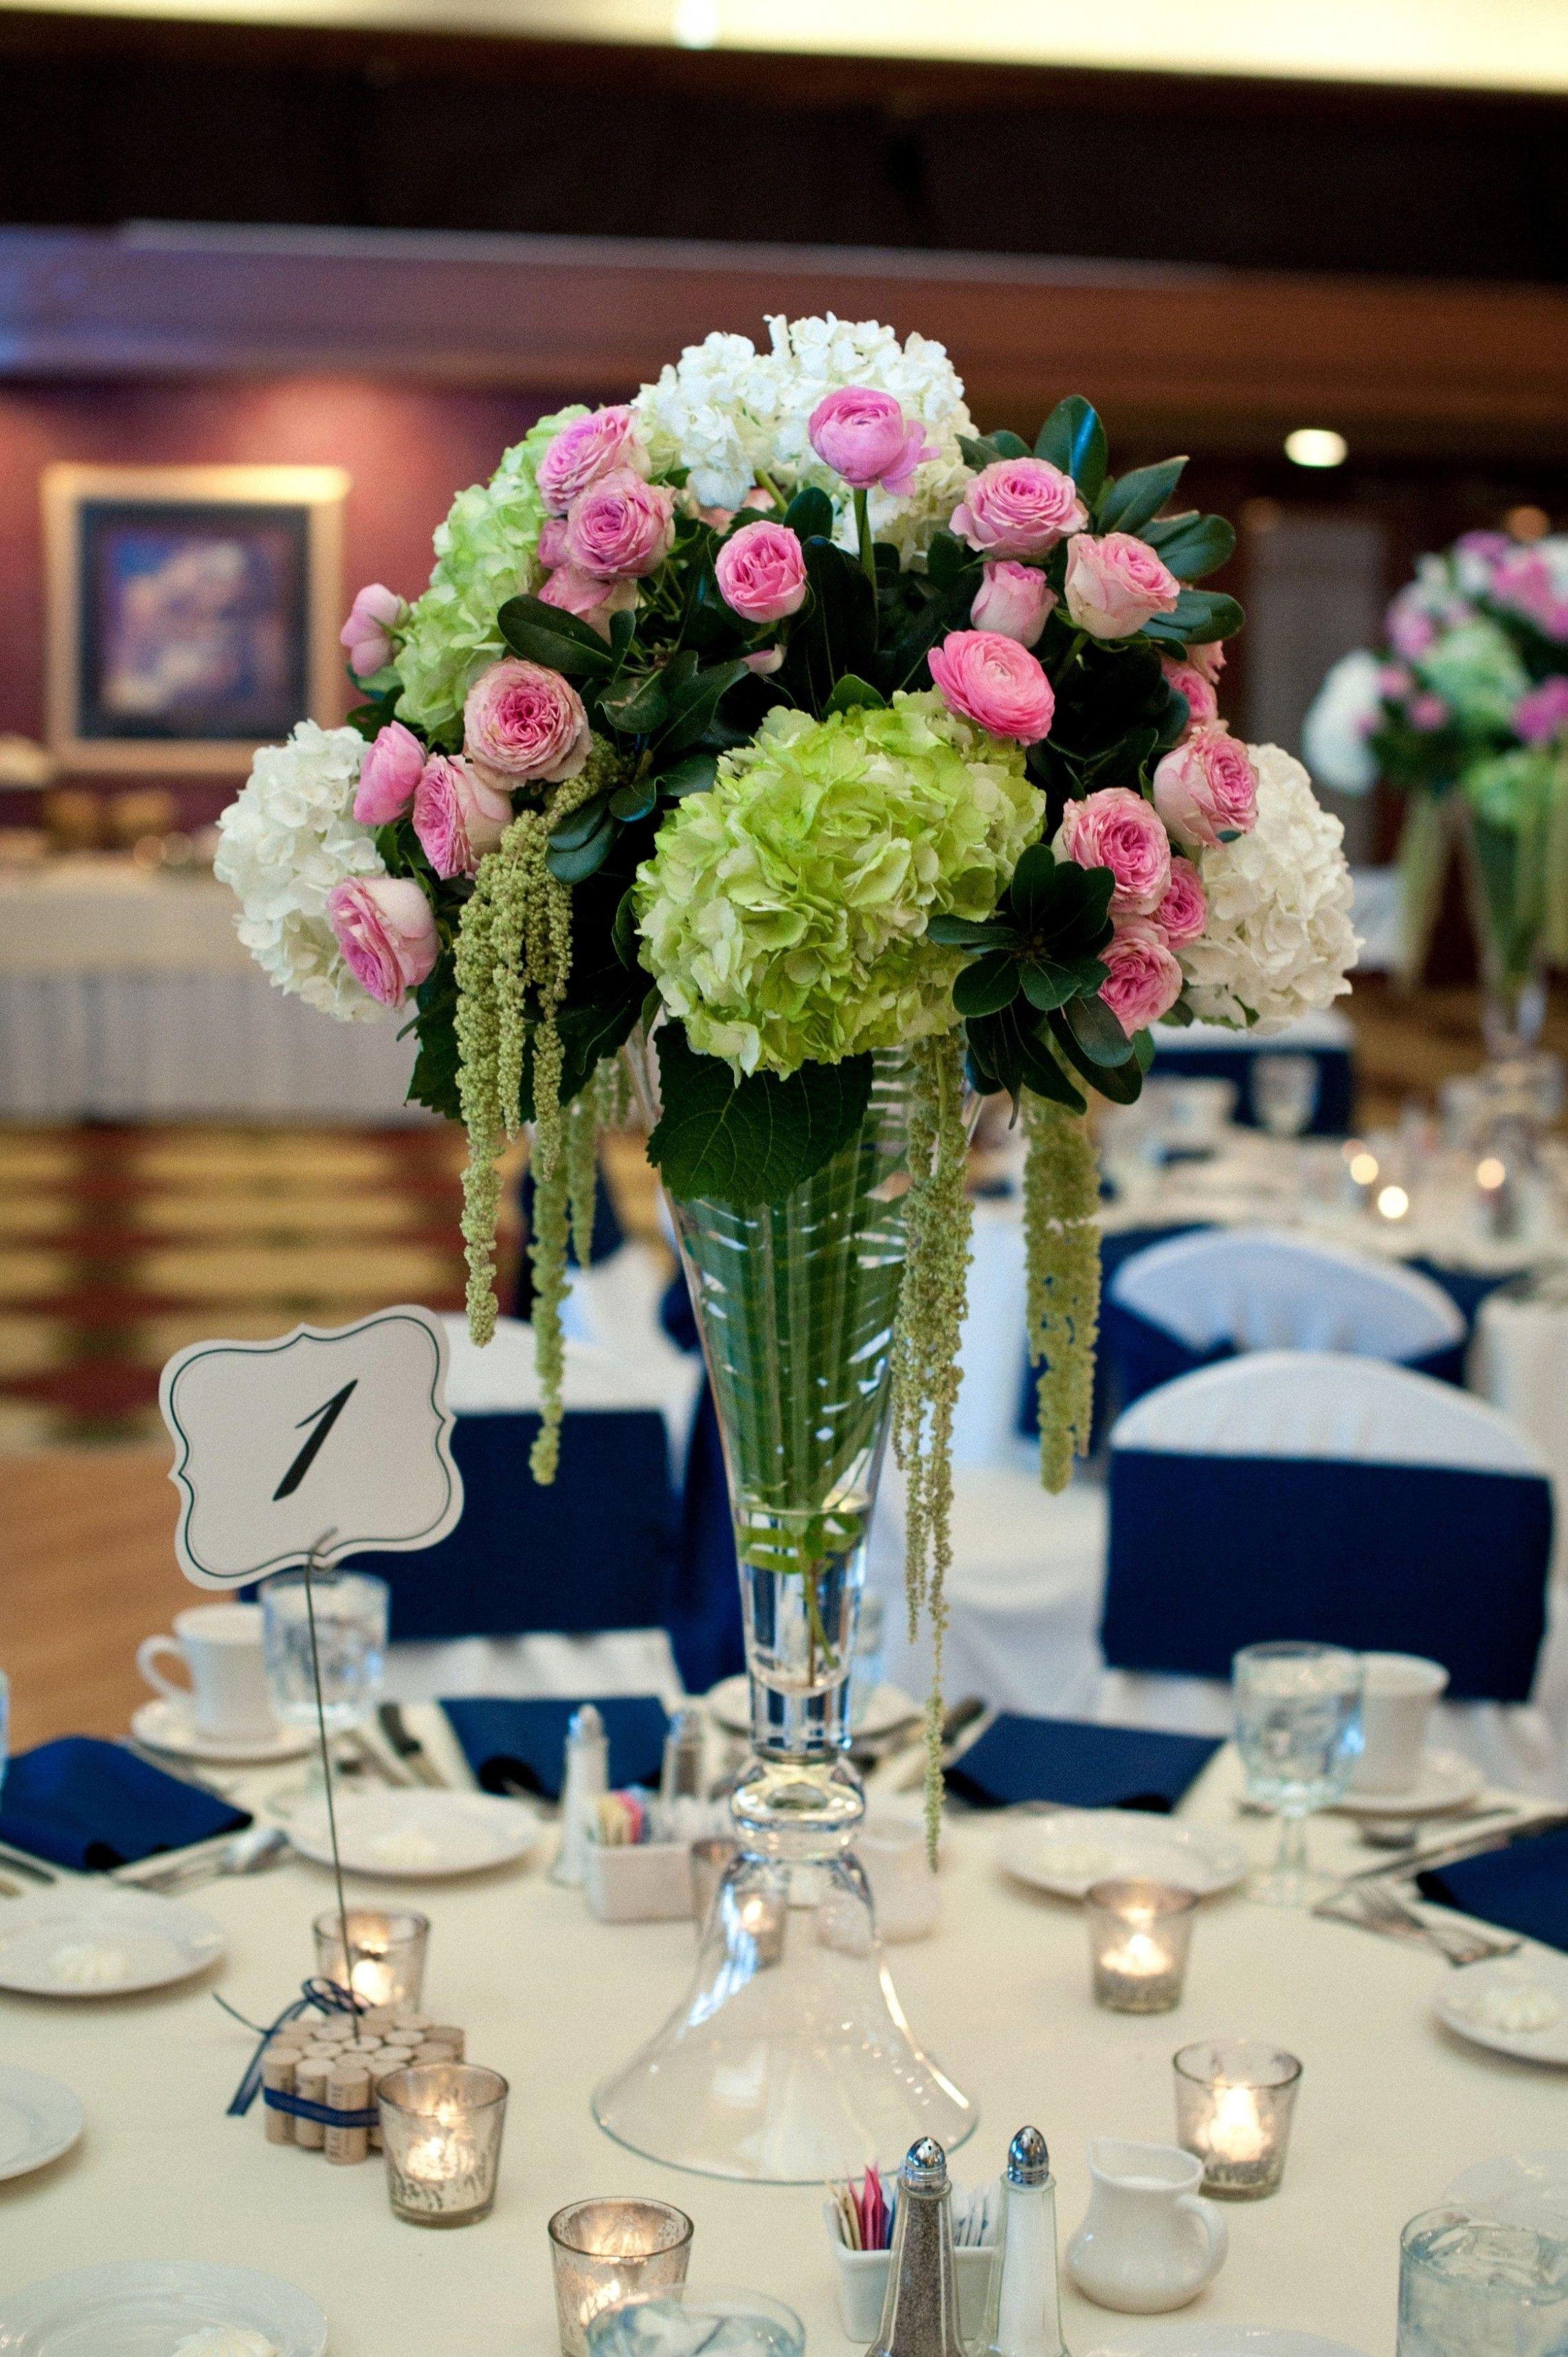 glass light bulb vase of tulip bulb vase beautiful mirrored square vase 3h vases mirror table in tulip bulb vase beautiful mirrored square vase 3h vases mirror table decorationi 0d weddings